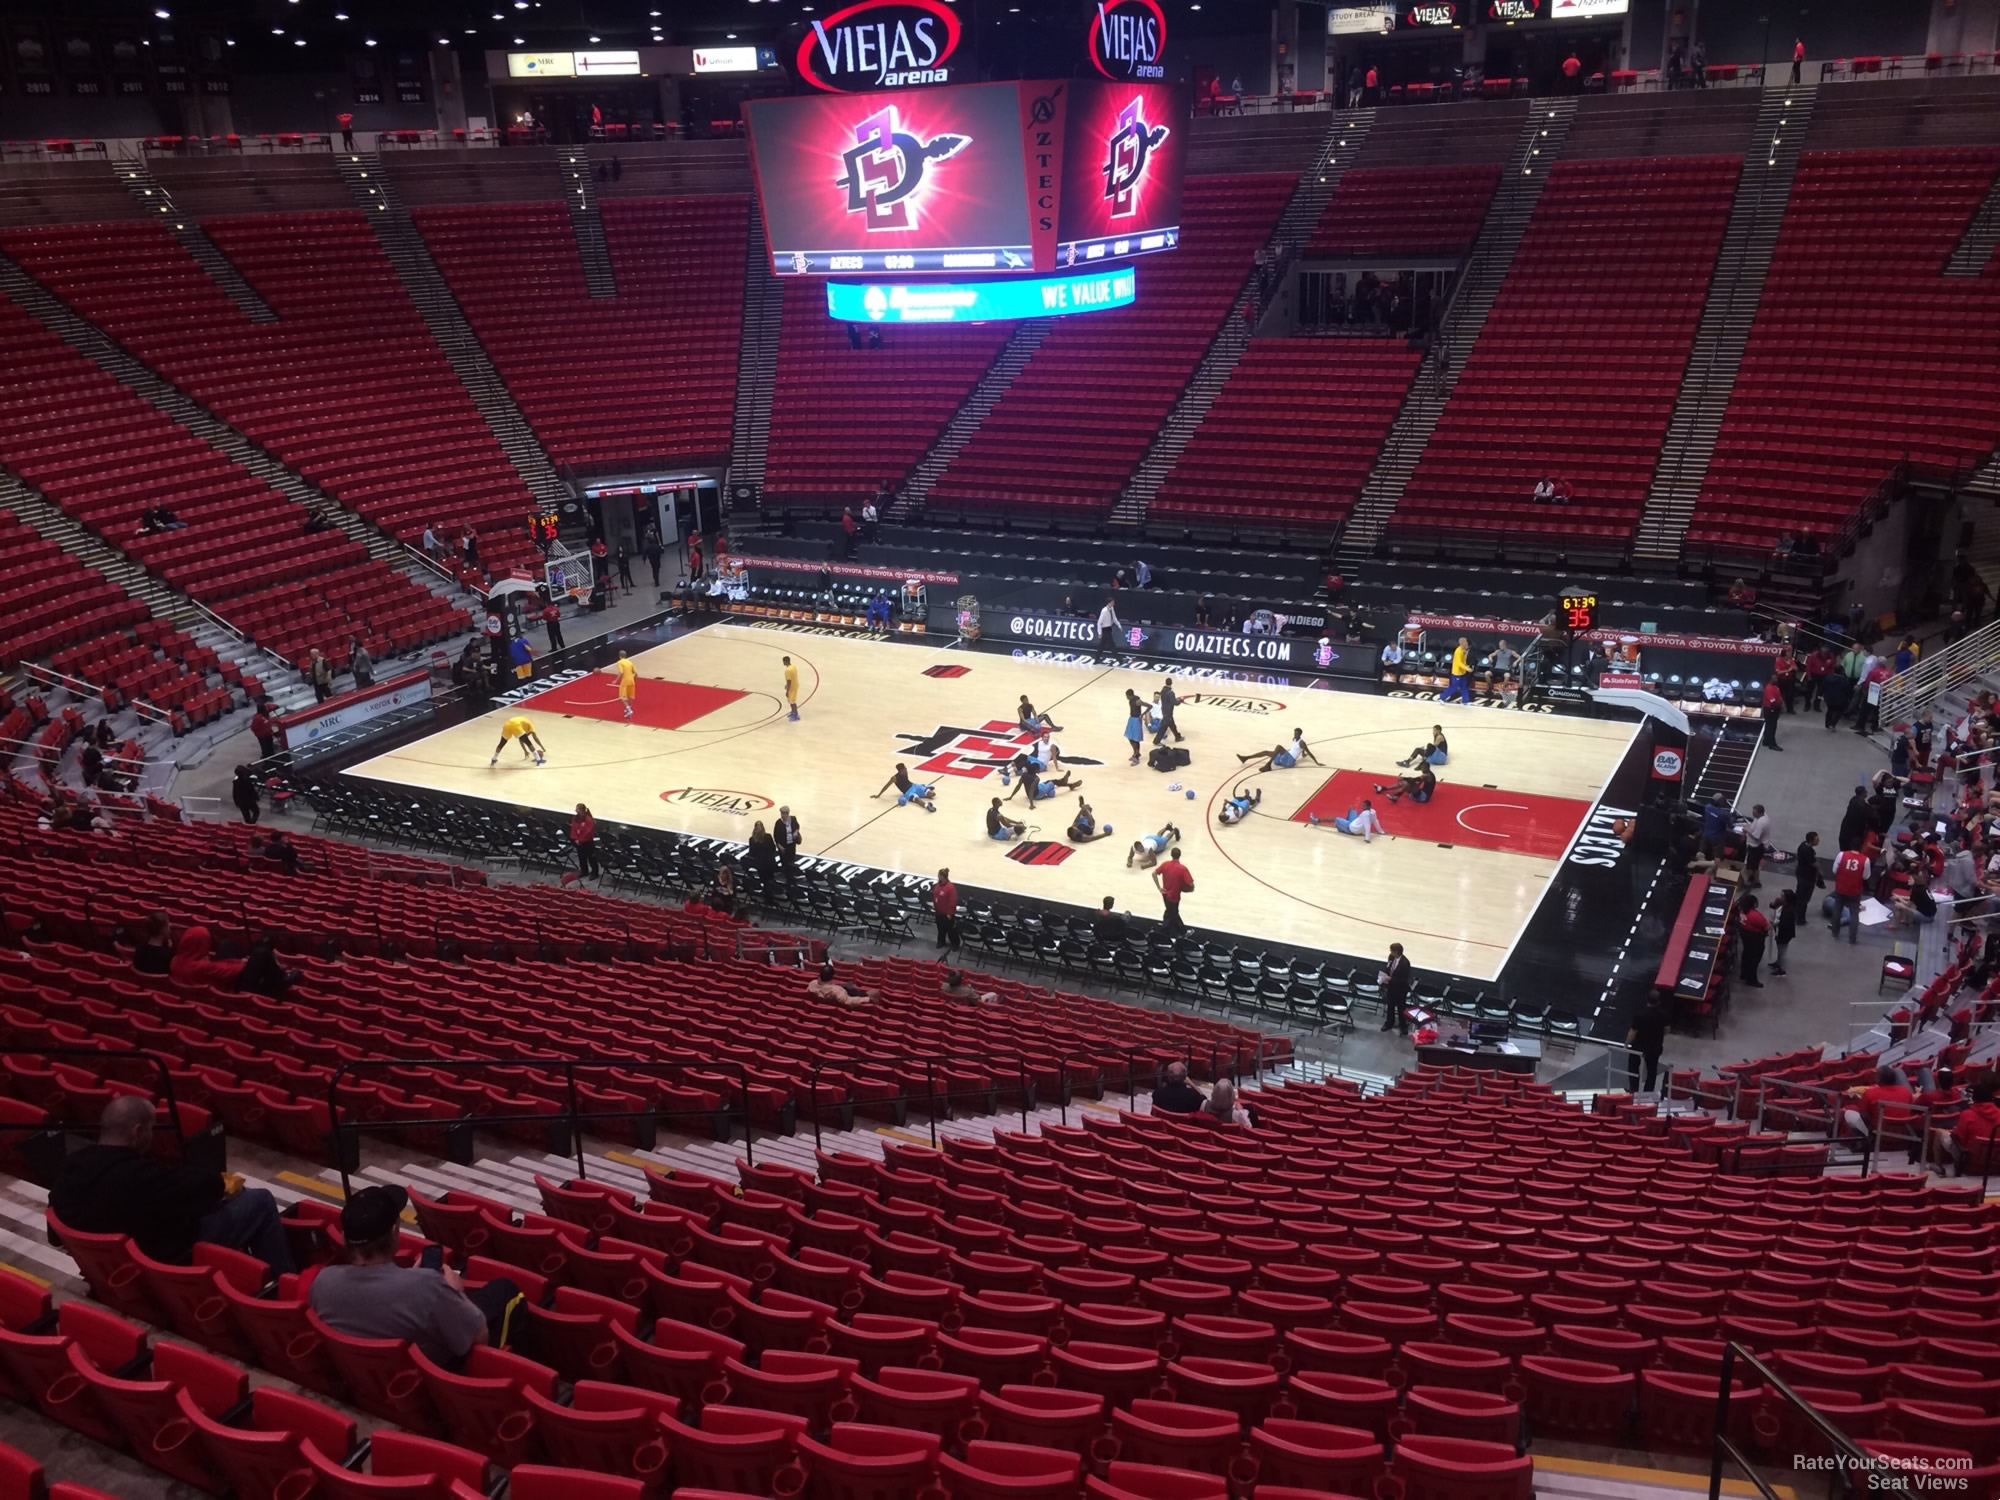 Viejas Arena Section H Rateyourseatscom